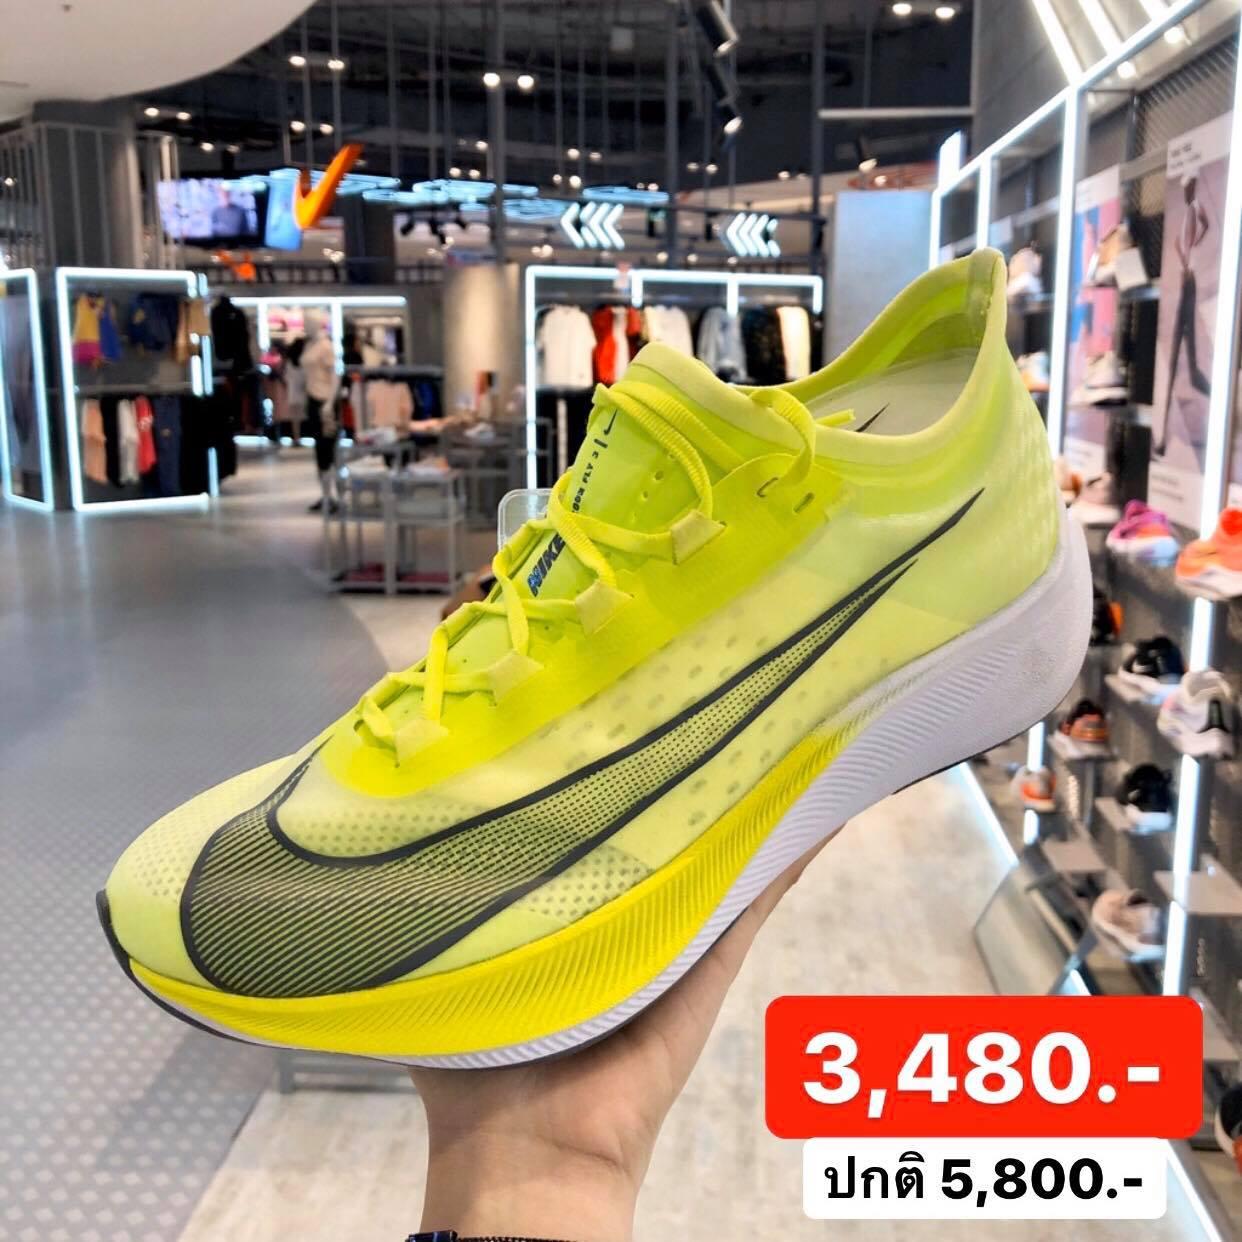 Nike Sports Mall